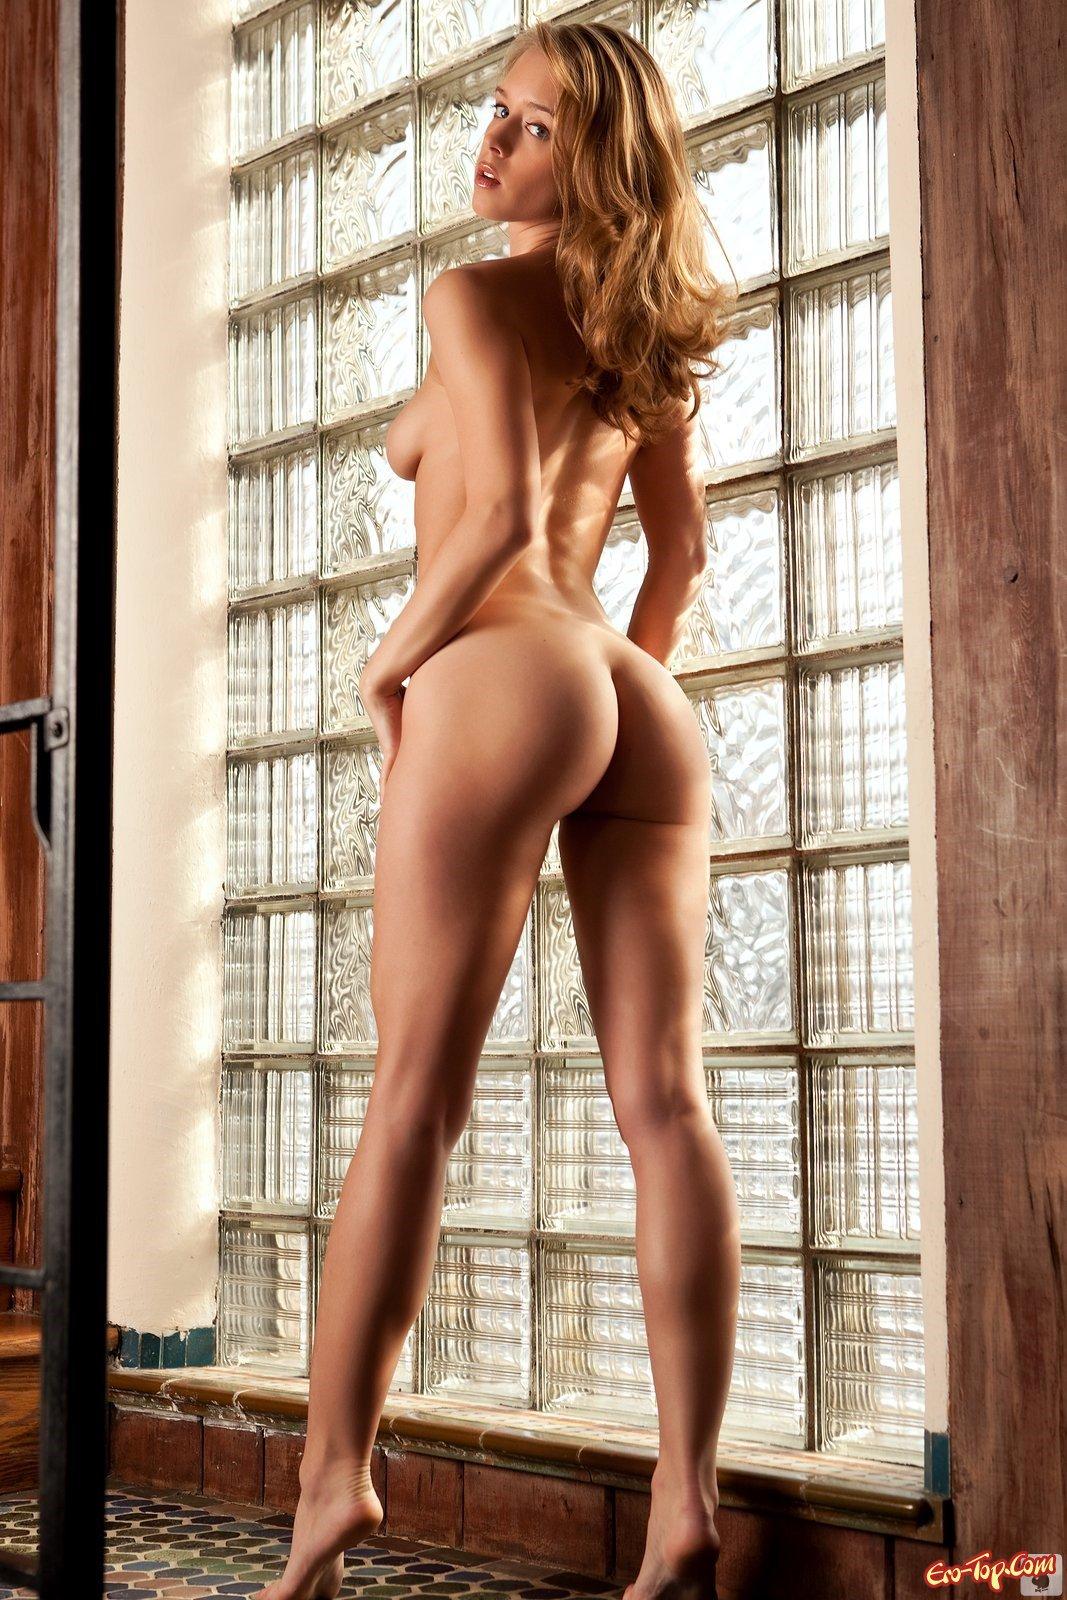 Laura Lynn - голенькая блондинка плейбоя. Фото эротика.